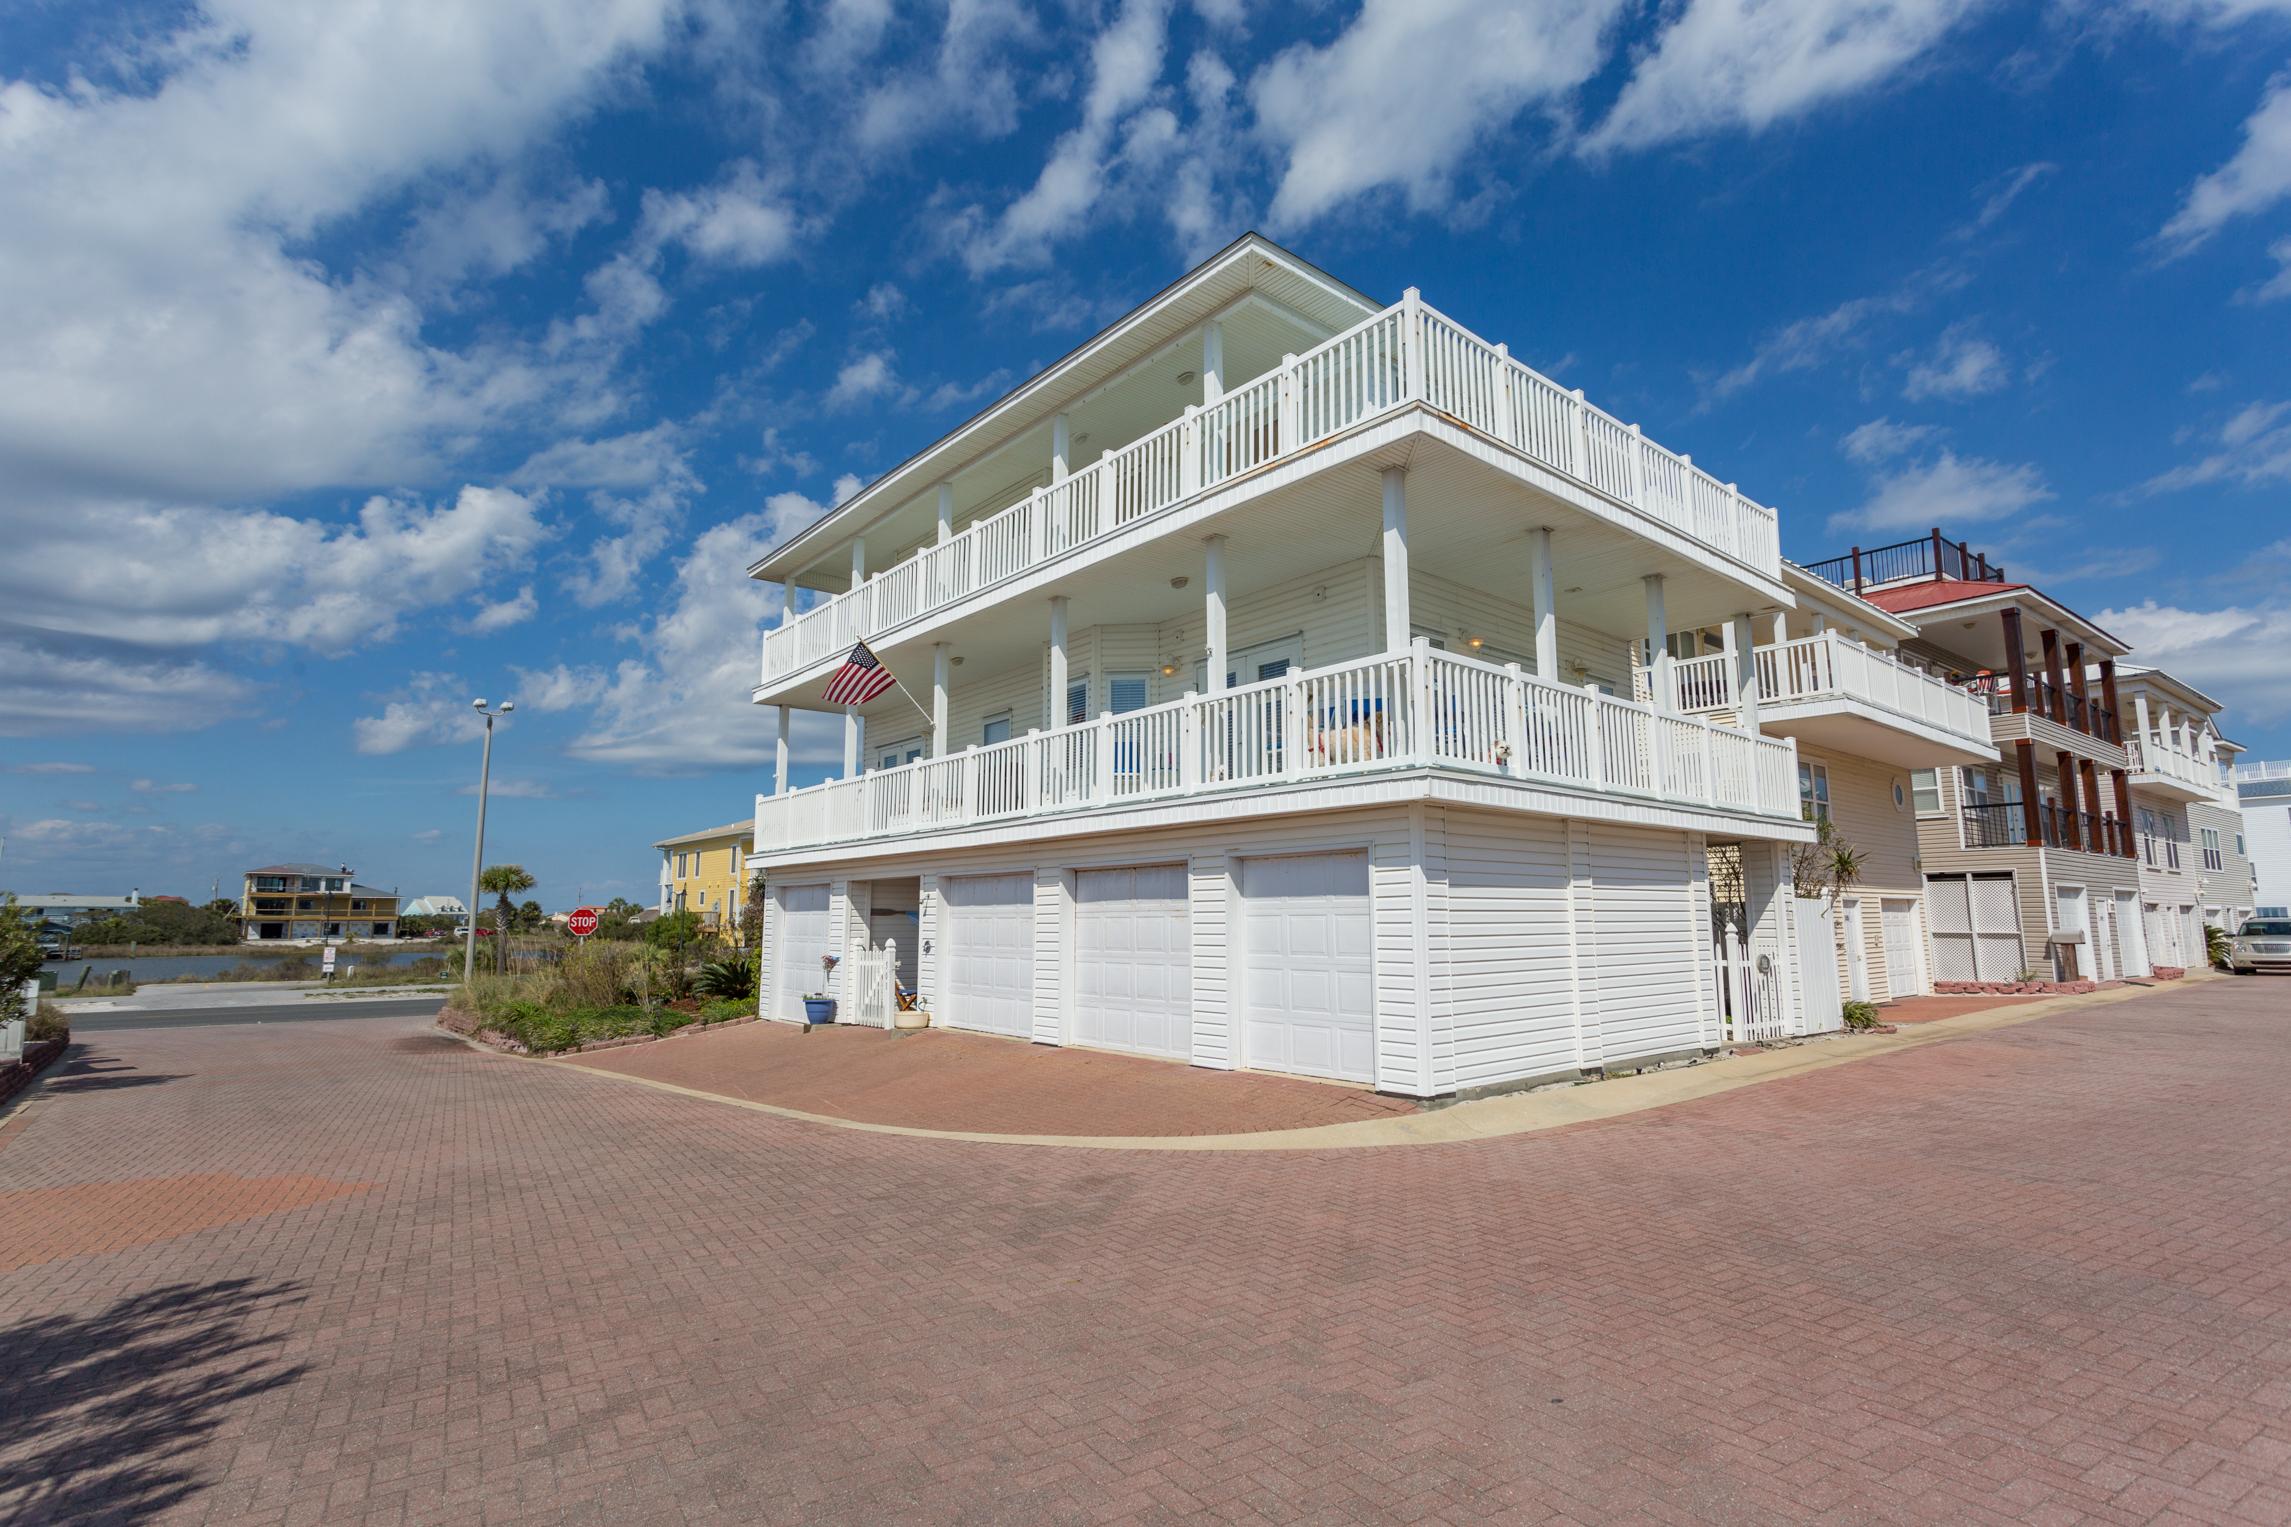 White Sands Cottage 501 Life's a Beach House Townhouse rental in White Sands Pensacola Beach in Pensacola Beach Florida - #42